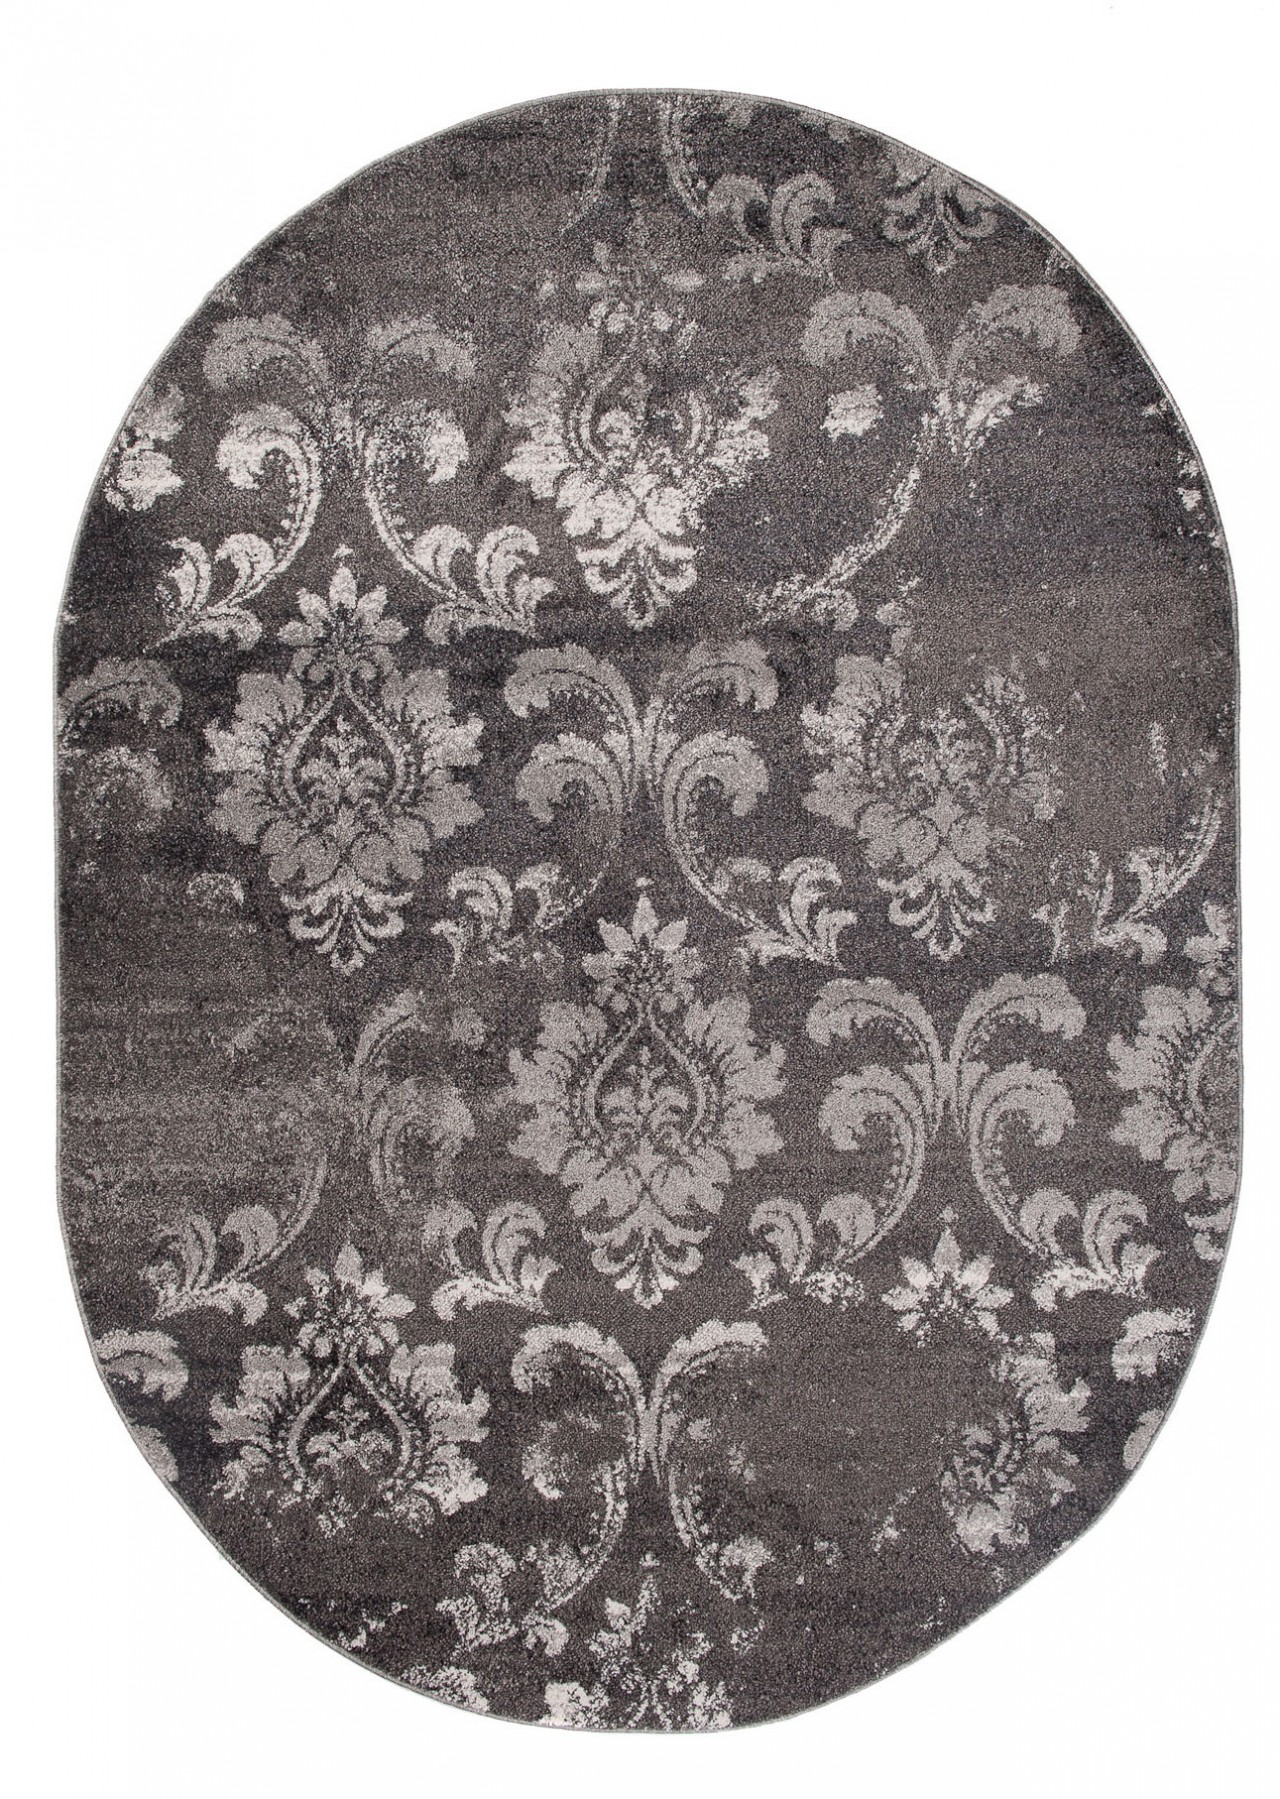 teppich wohnzimmer oval teppiche meliert kurzflor muster ornamente farbe grau qualit t neu. Black Bedroom Furniture Sets. Home Design Ideas